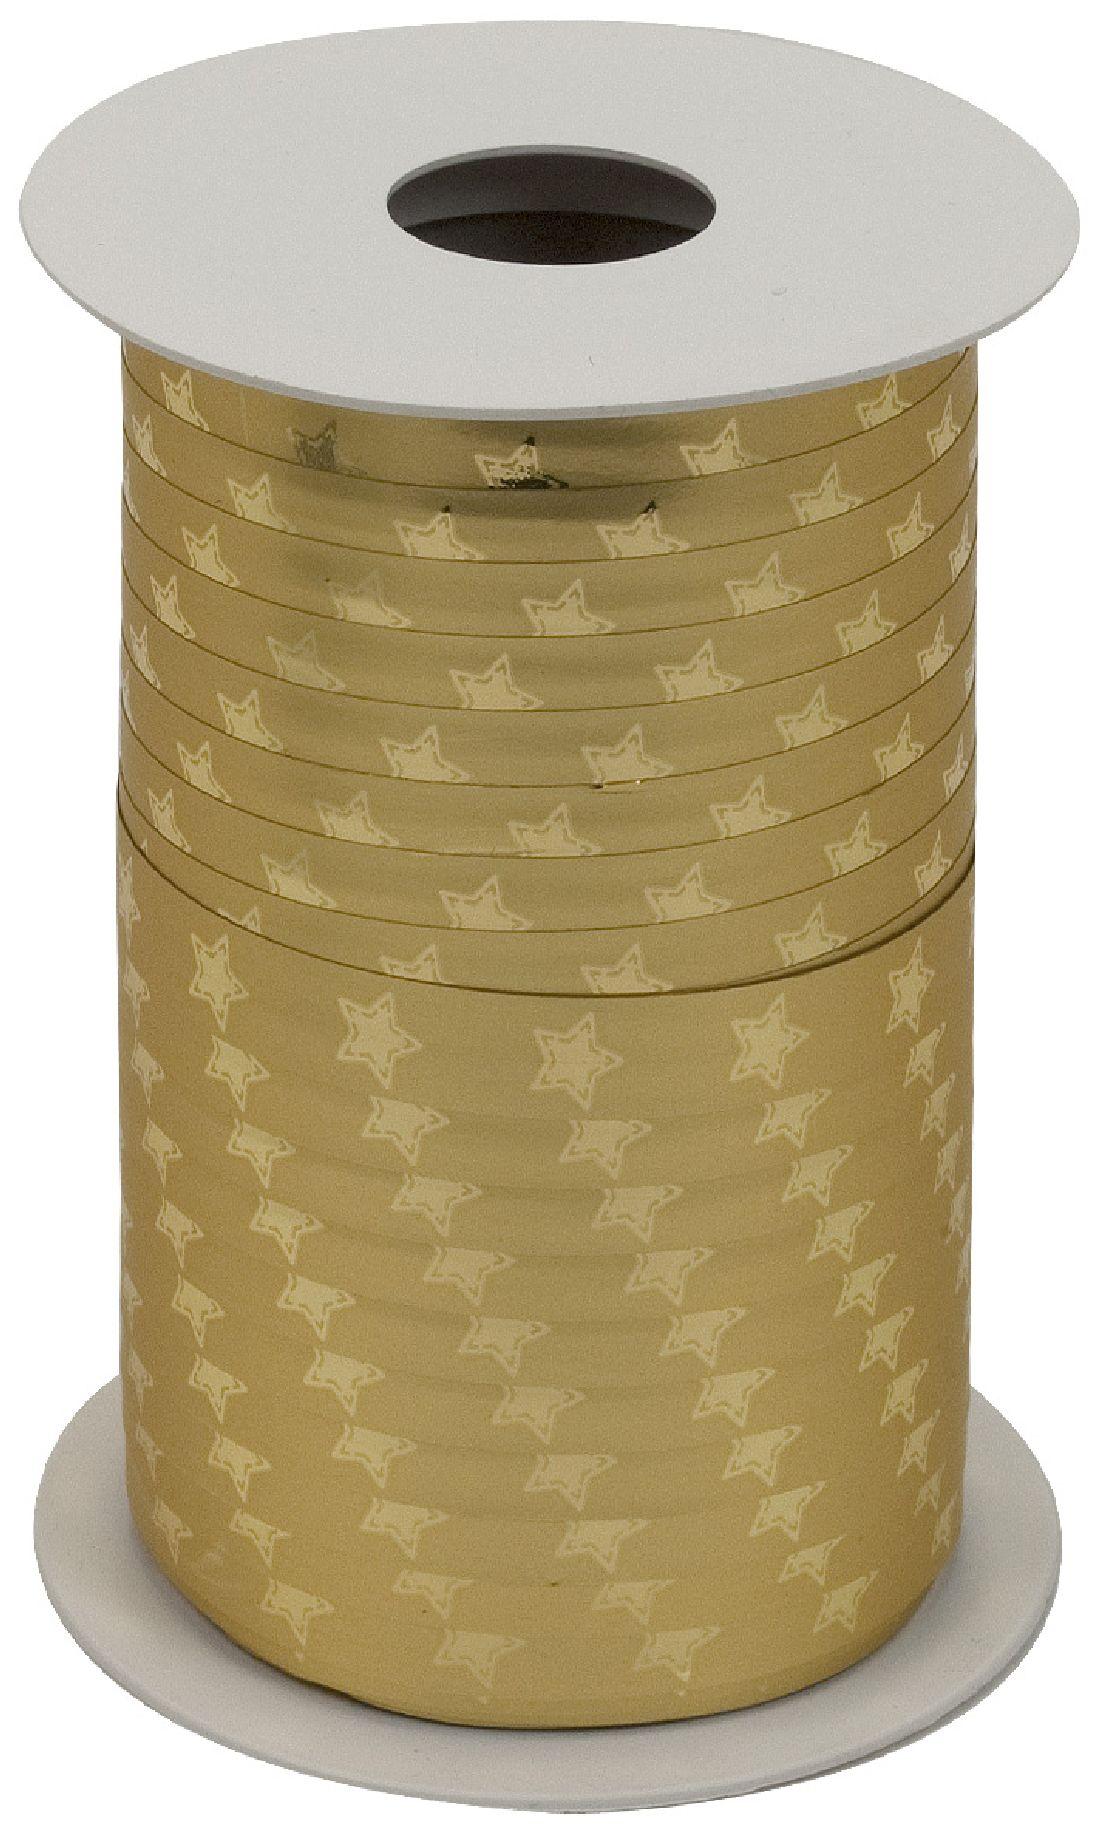 Polyband X-MAS Edition GOLD METALLIC Ringelband 10mm 150Meter Ziehband